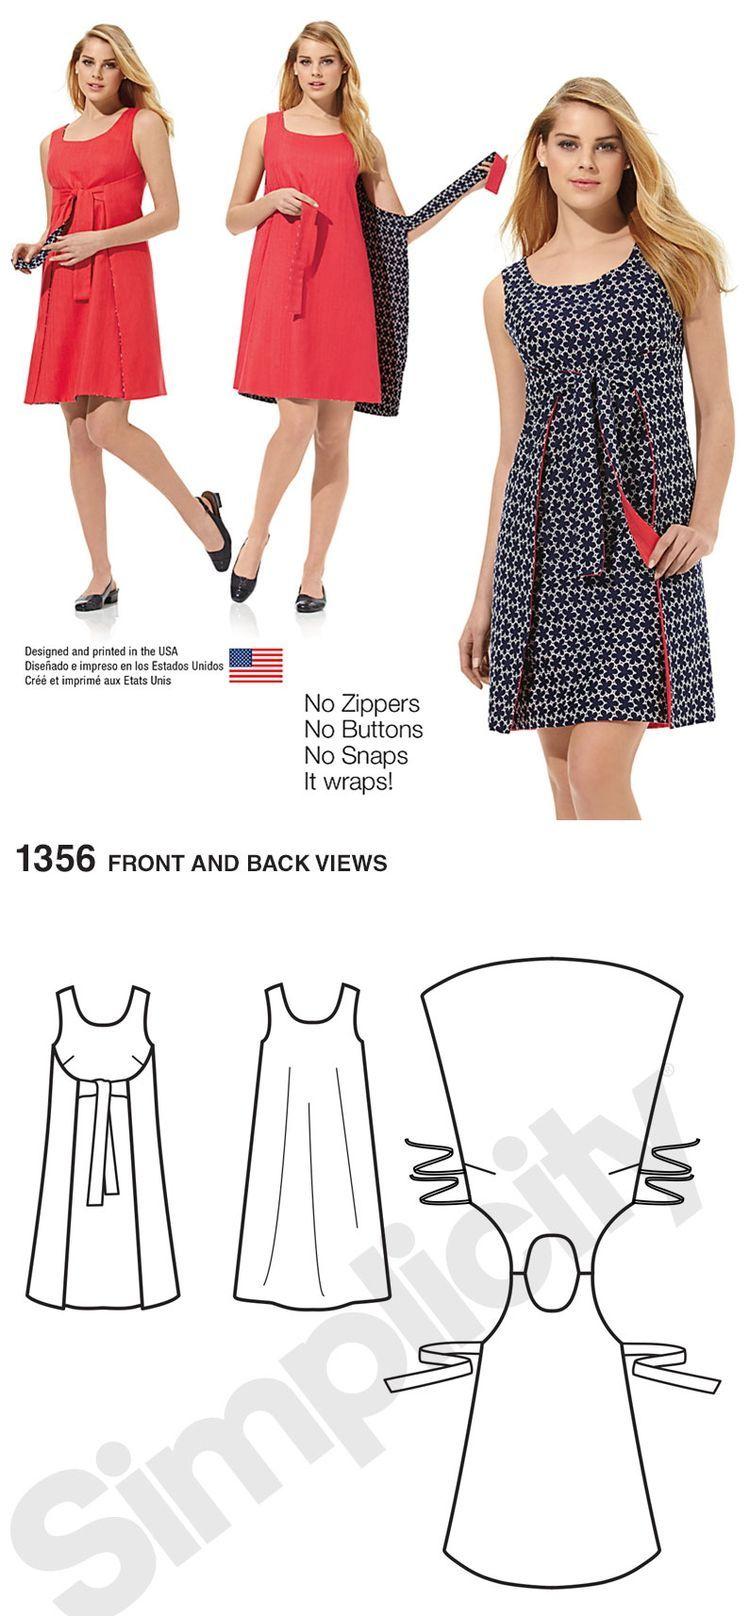 E0ecba23f2330577d74e4c4bb8420fac Jpg 750 1 616 Pixels Patron Couture Gratuit Modele Couture Couture Facile Robe